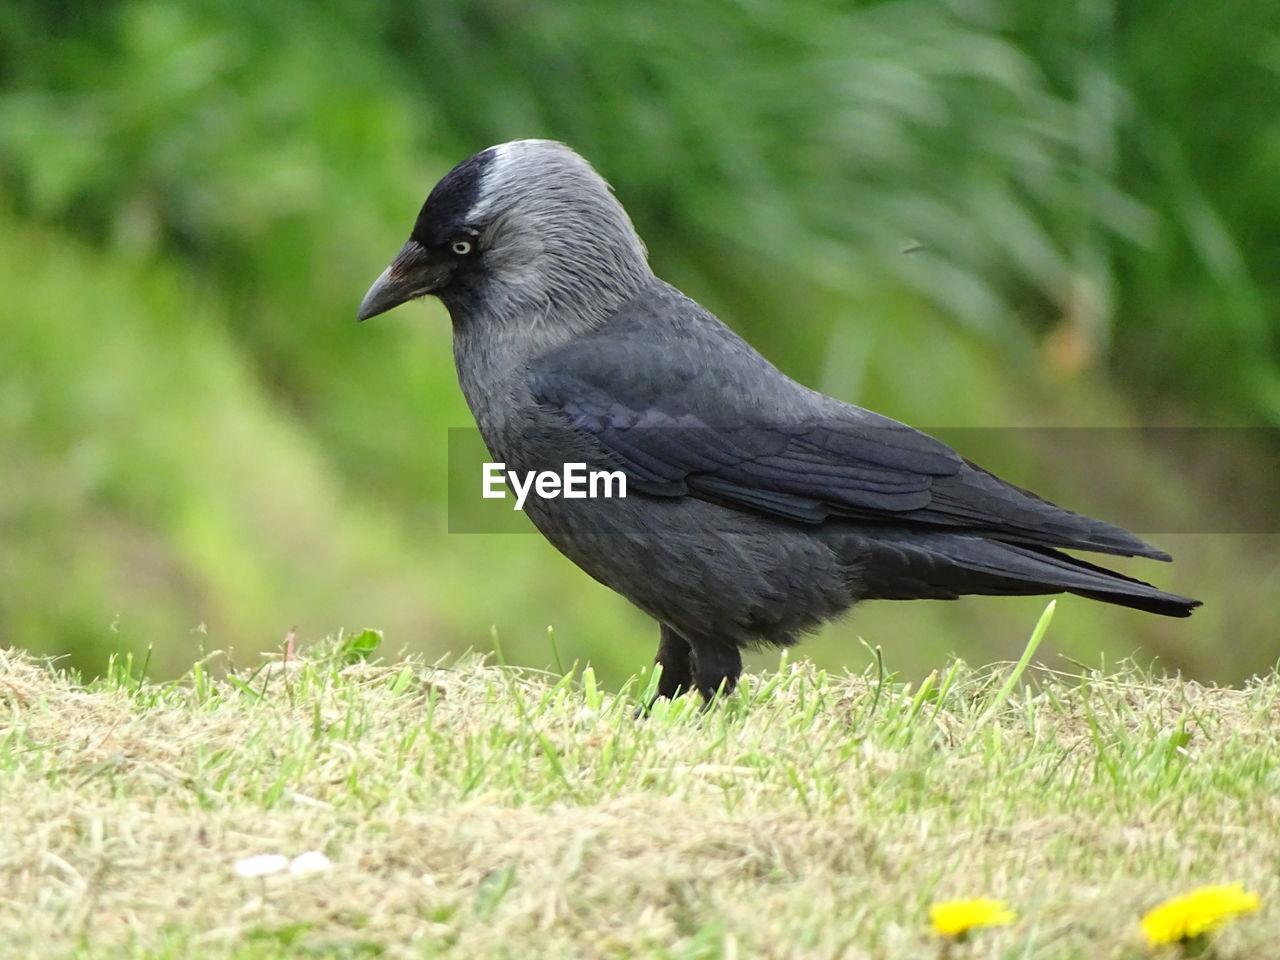 one animal, bird, animal themes, animals in the wild, nature, day, no people, grass, animal wildlife, field, blackbird, outdoors, close-up, crow, raven - bird, full length, perching